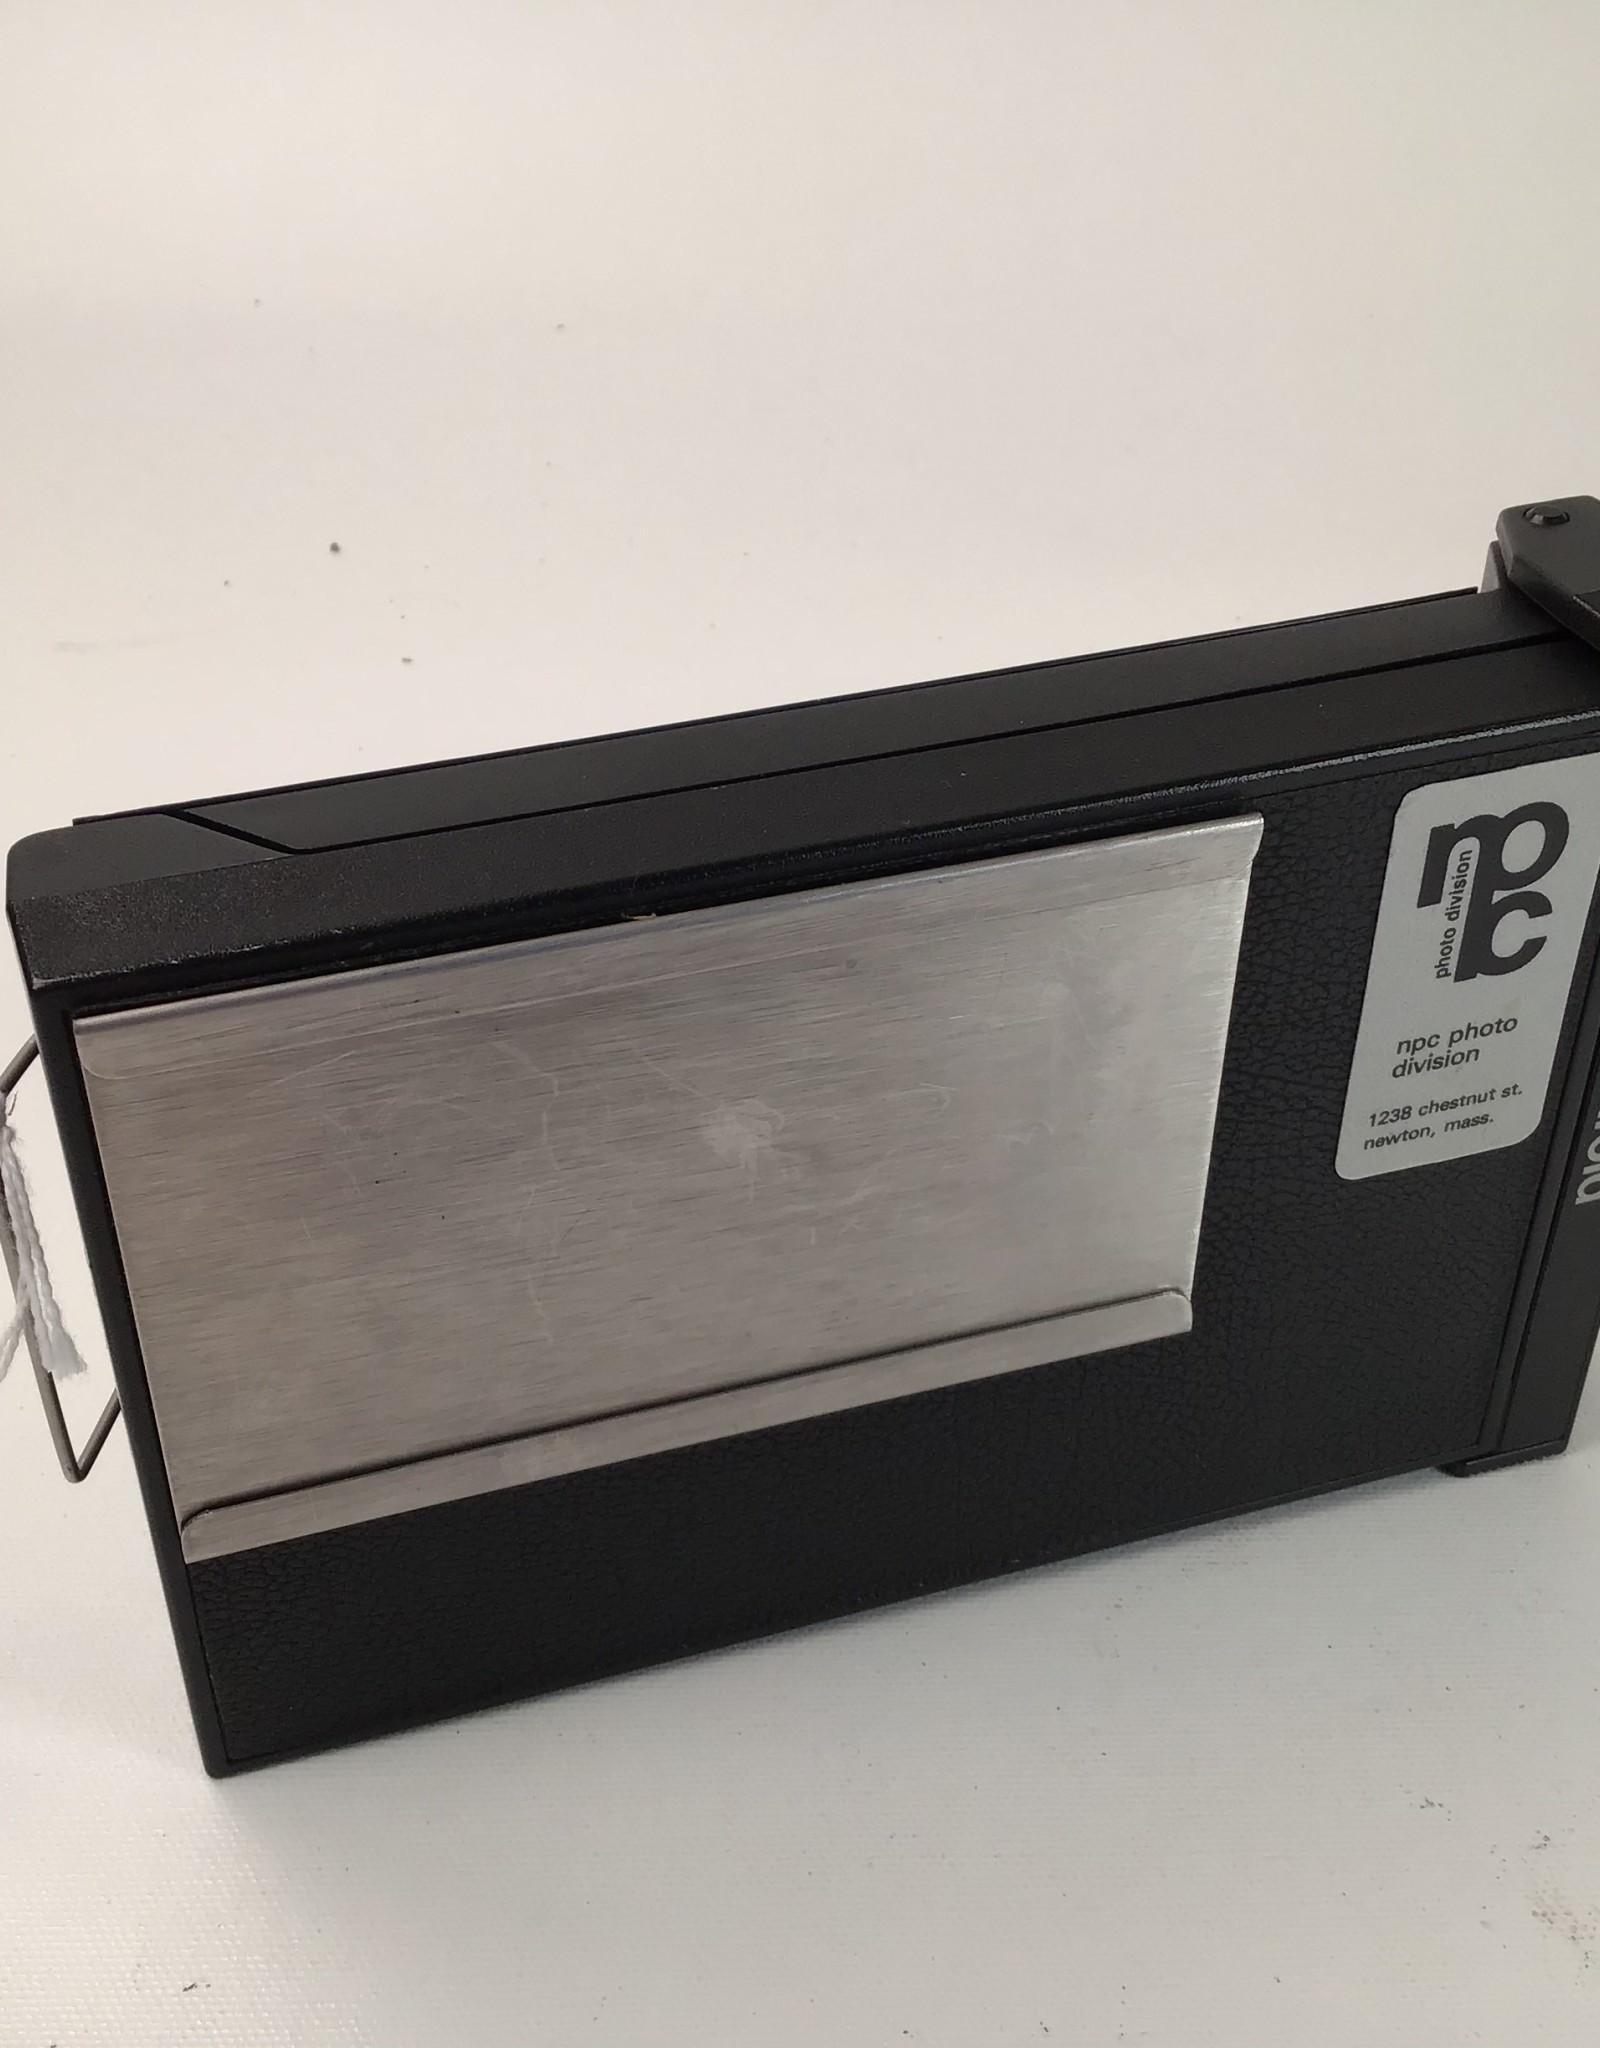 NPC Polaroid Back for Hasselblad Used EX